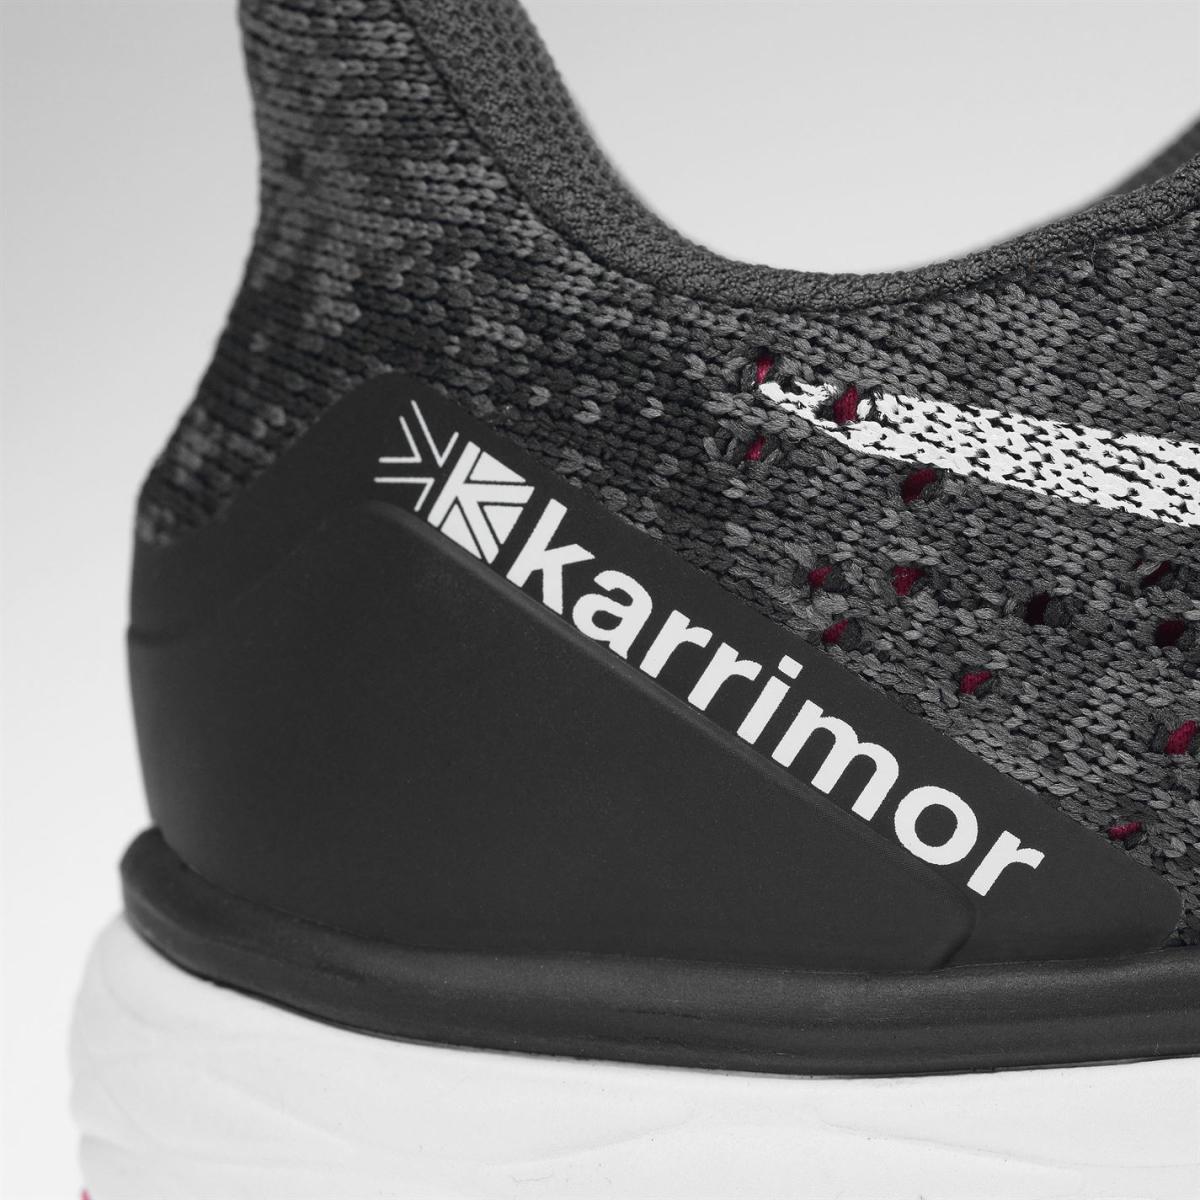 Karrimor-Rapid-Turnschuhe-Damen-Sneaker-Sportschuhe-Laufschuhe-4815 Indexbild 6